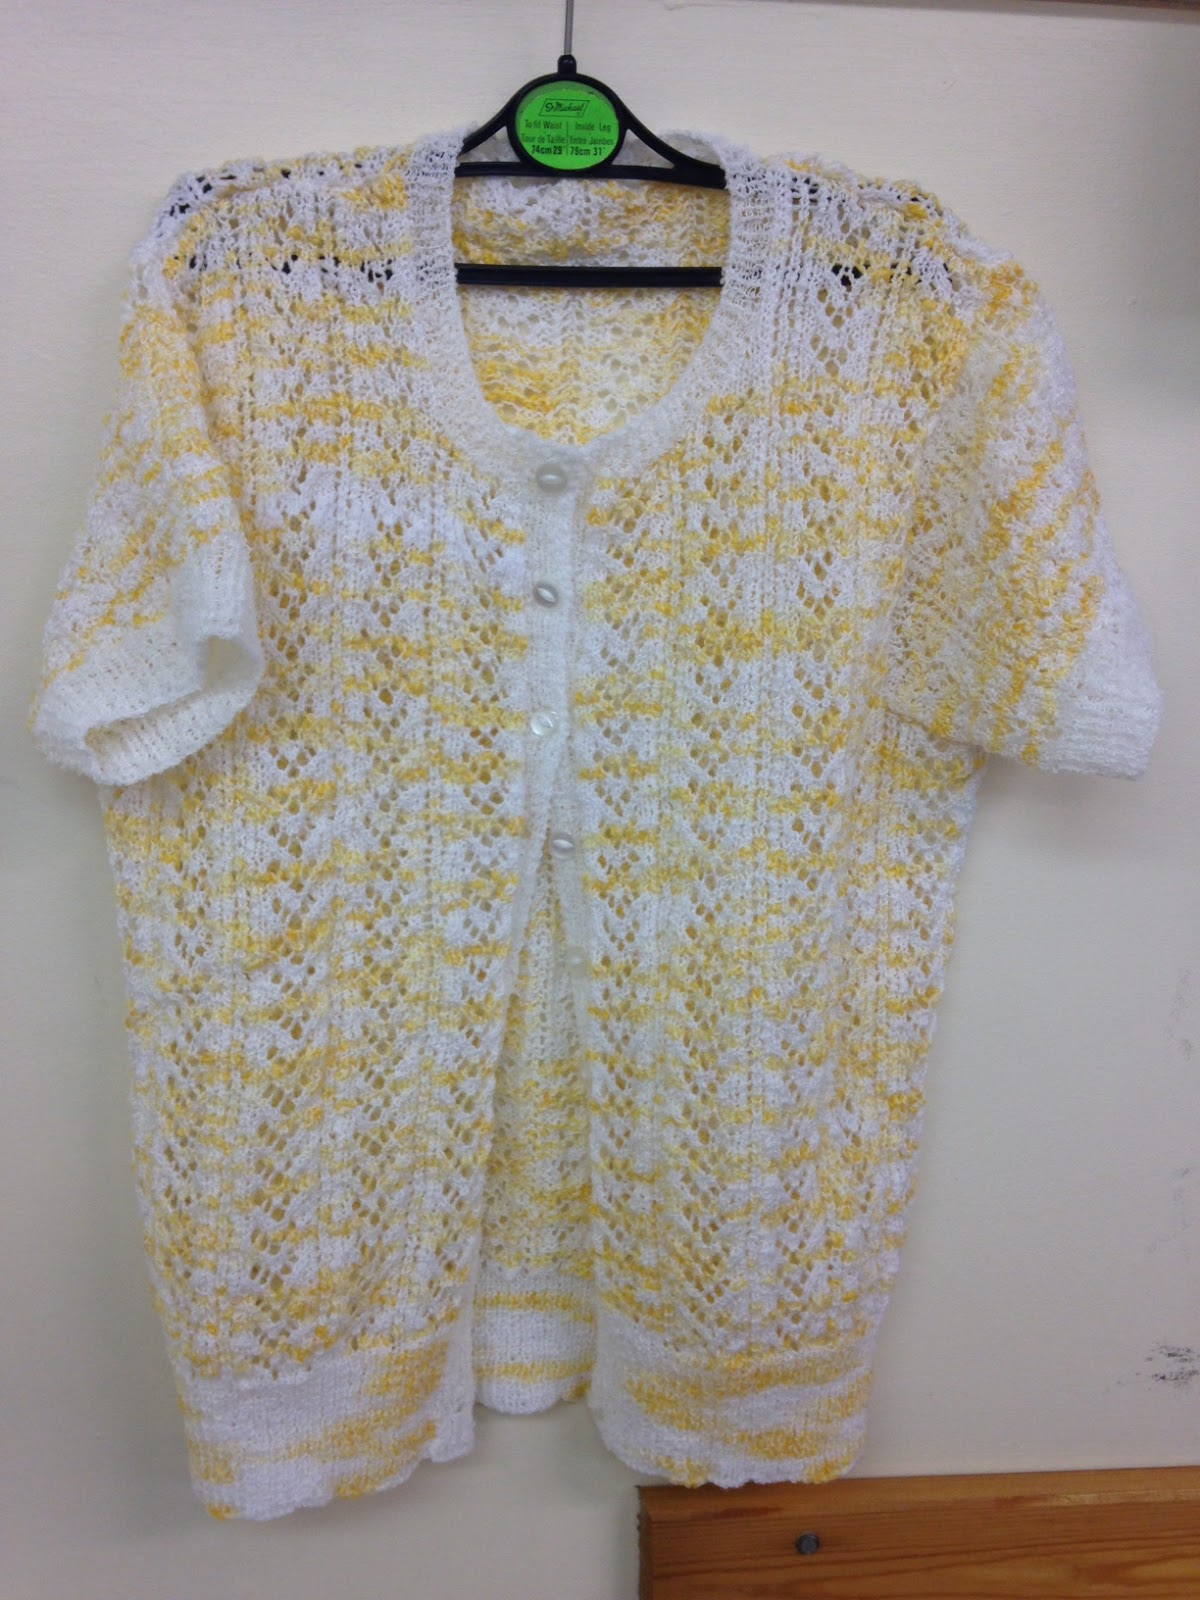 Fleet Knitting Club: October 2016 - Talk by Joyce Mead